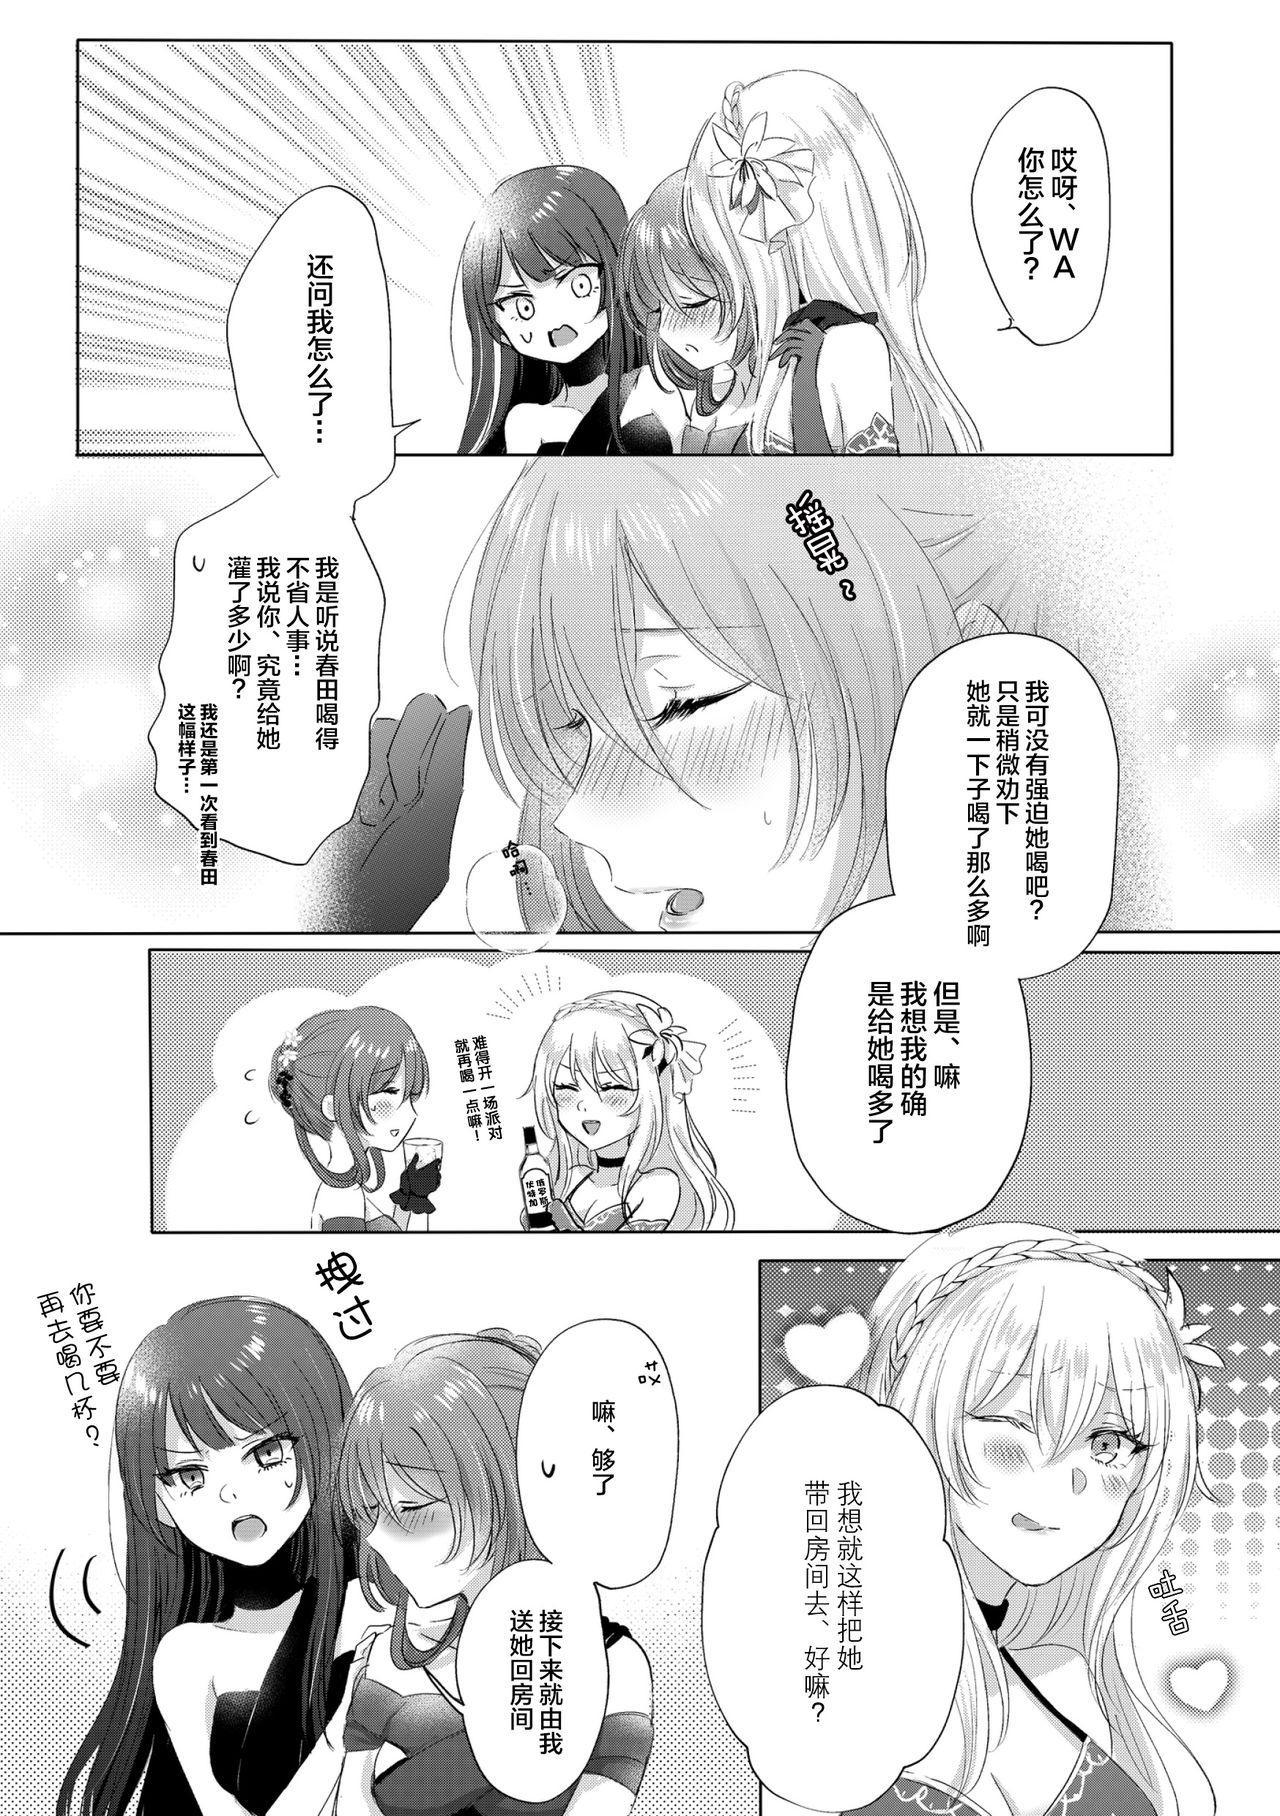 [(Yuri=18L)sui] Alcohol wa Amai (Girls' Frontline) [Chinese]   酒精是甘甜滋味 (少女前線) [提黄灯喵汉化组] 9